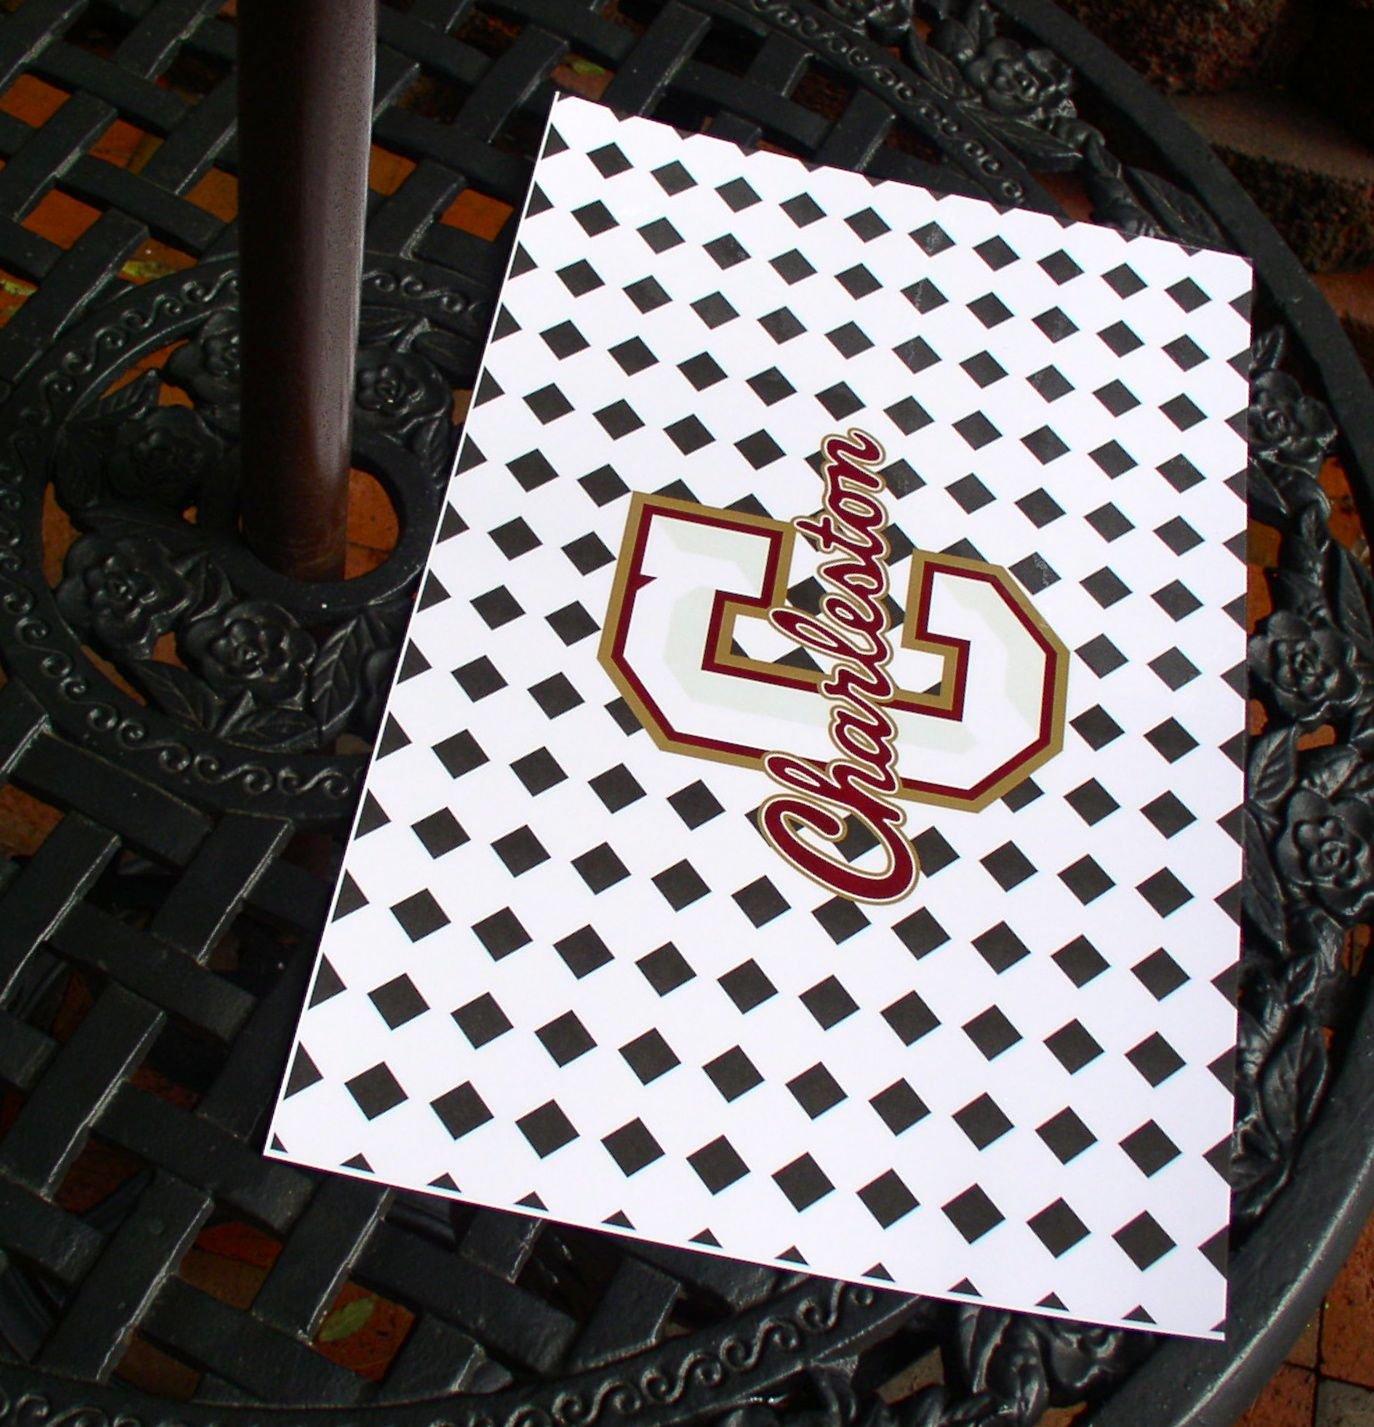 College of Charleston Tile Pattern laminated place mats - Set of 4